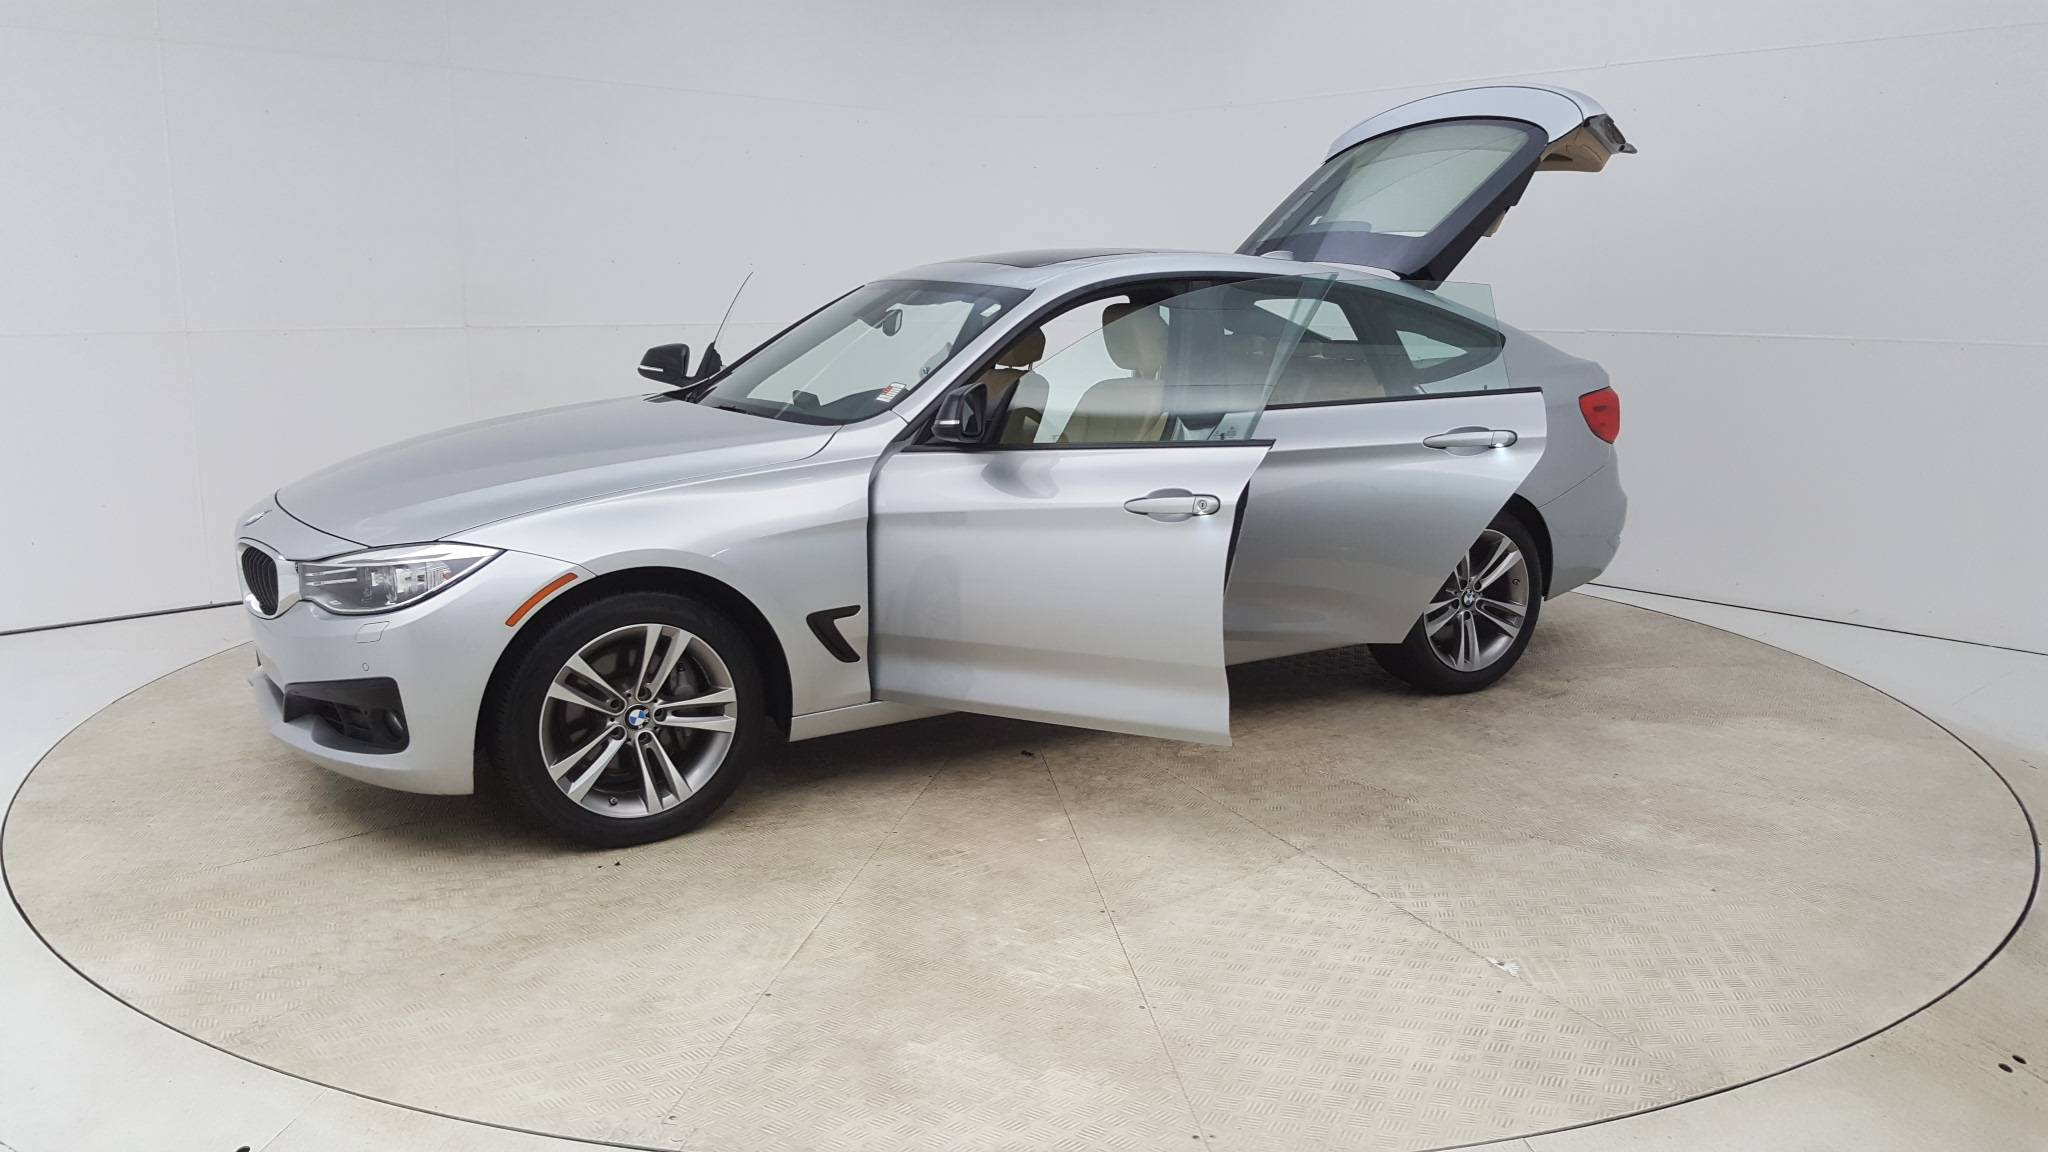 Pre-Owned 2015 BMW 335i xDrive Gran Turismo 335i xDrive